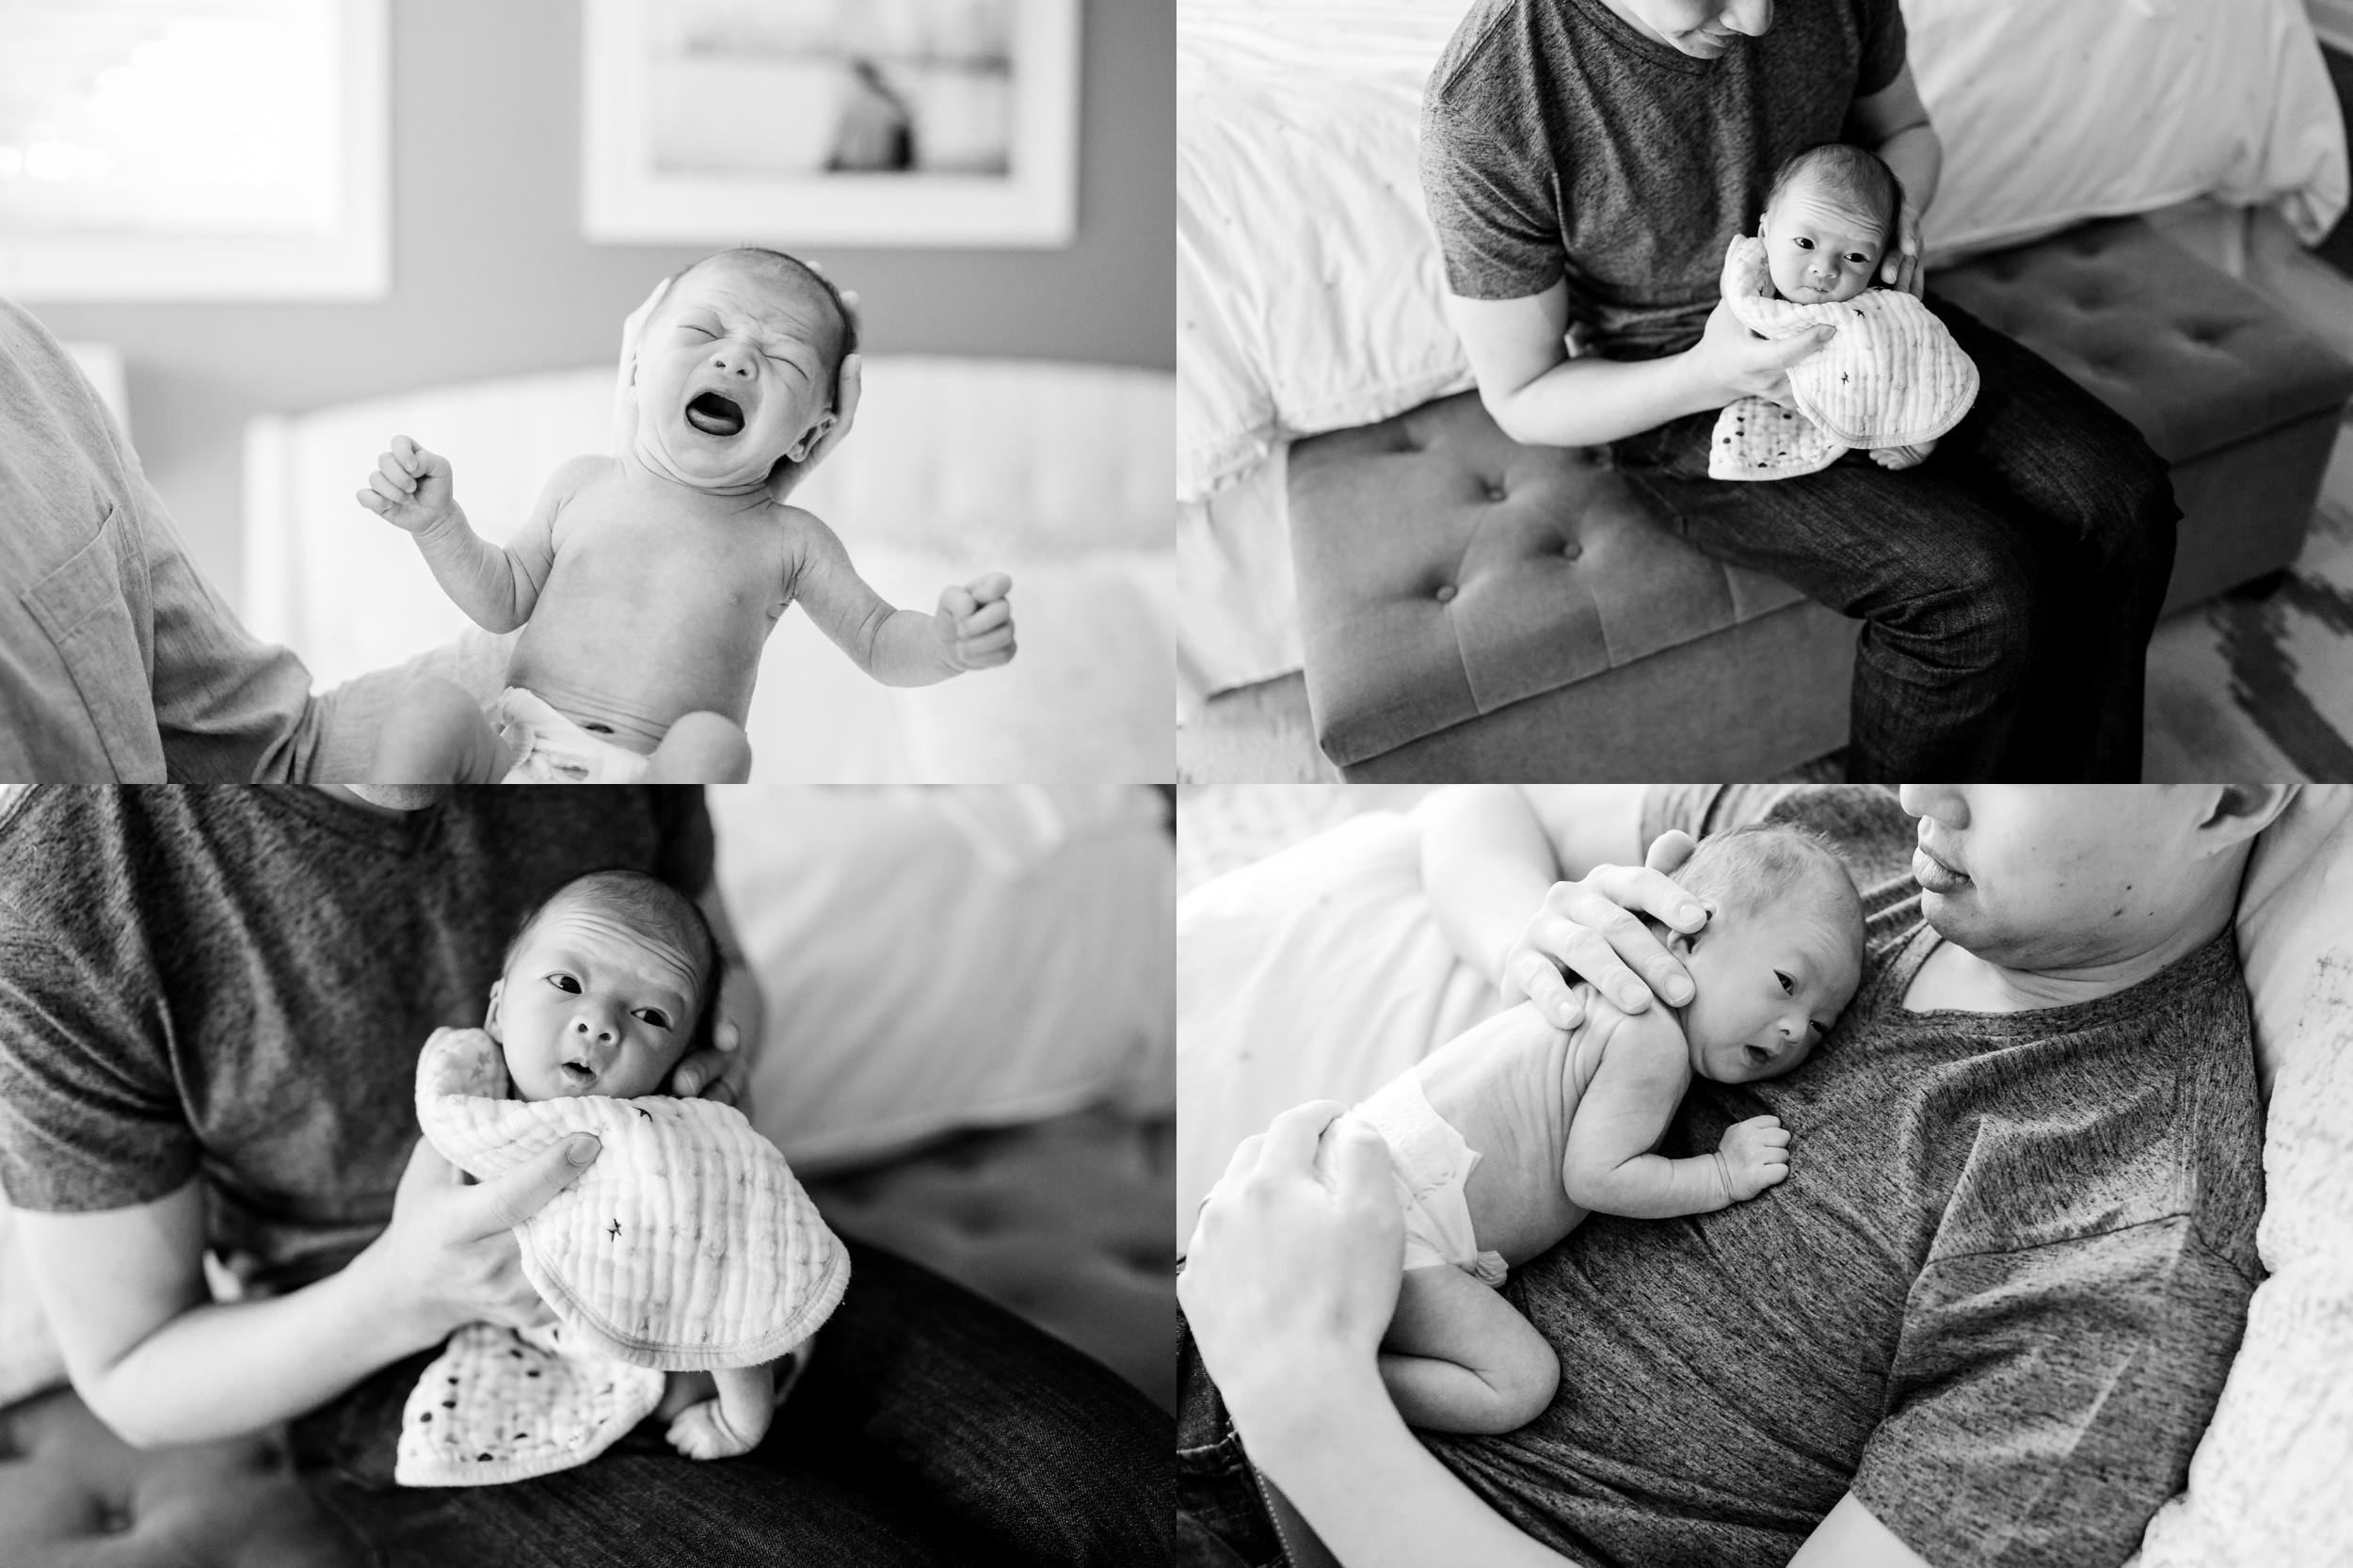 chicago-newborn-family-lifestyle-photographer-jenny-grimm-photography_0001.jpg